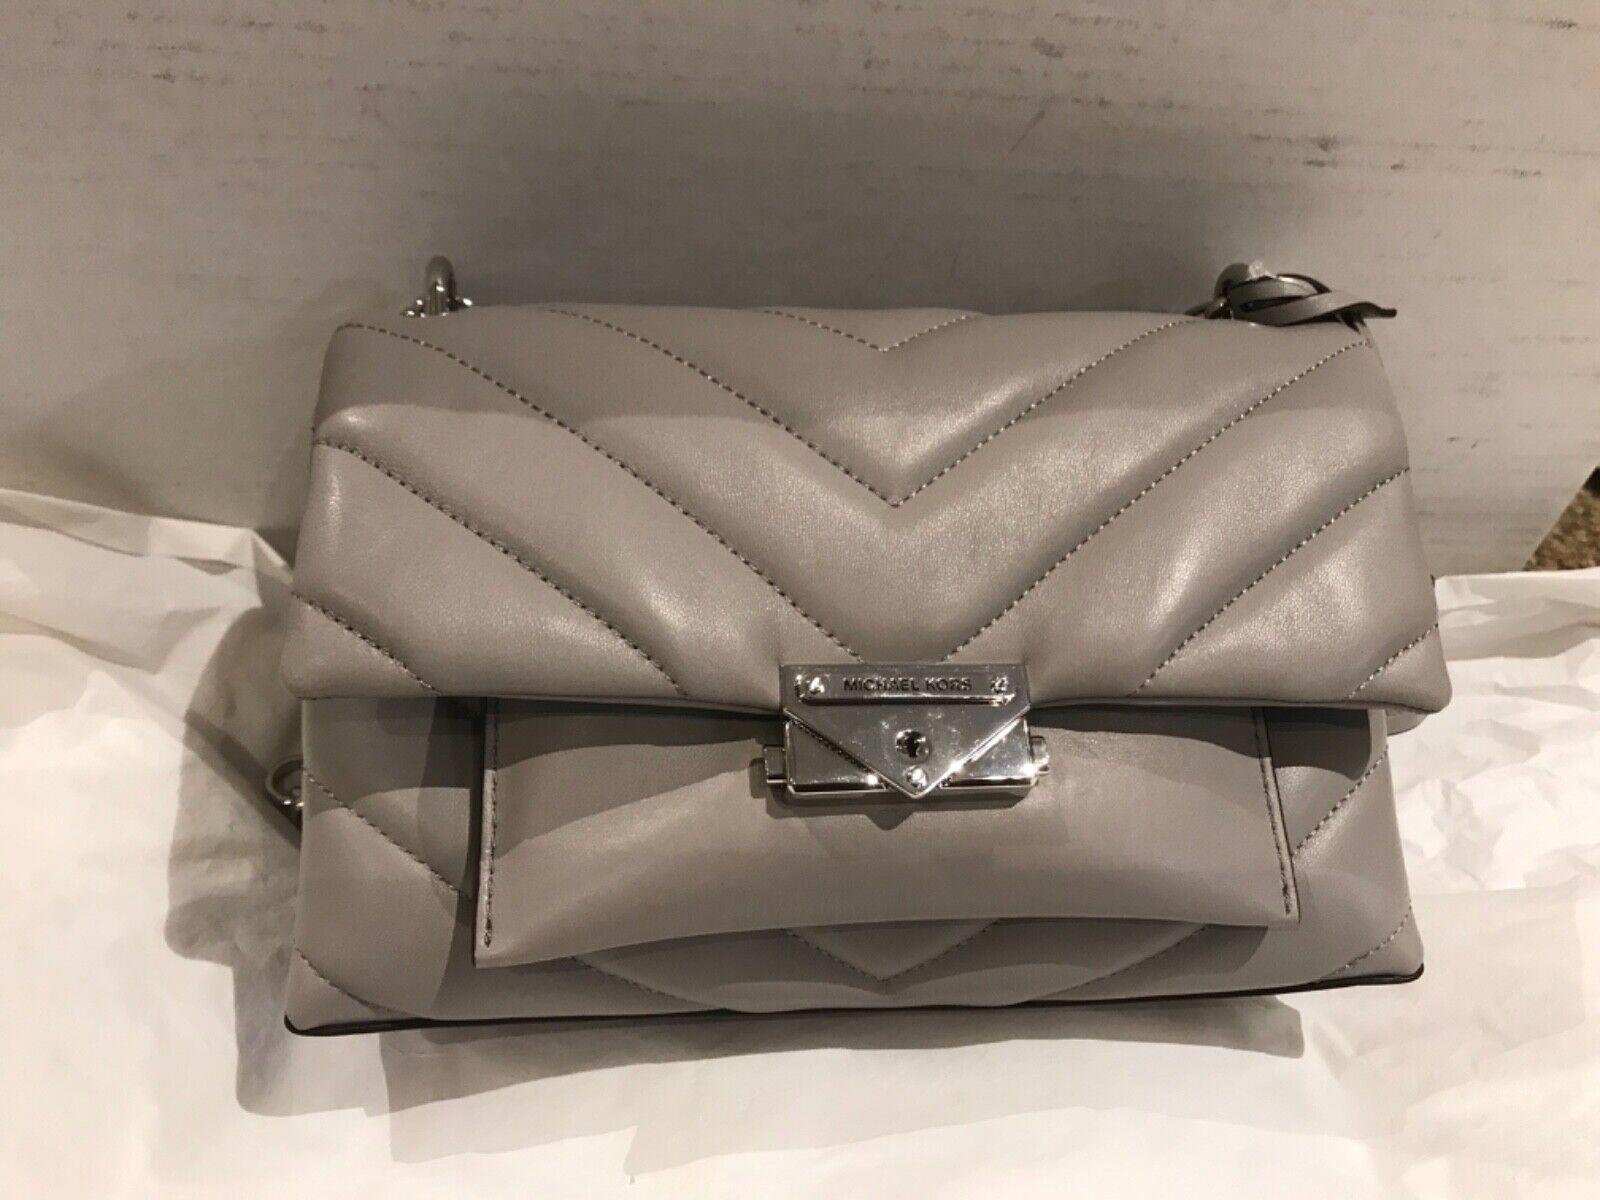 Michael Kors Cece Medium Leather Quilted Shoulder Bag Dark Gray Silver